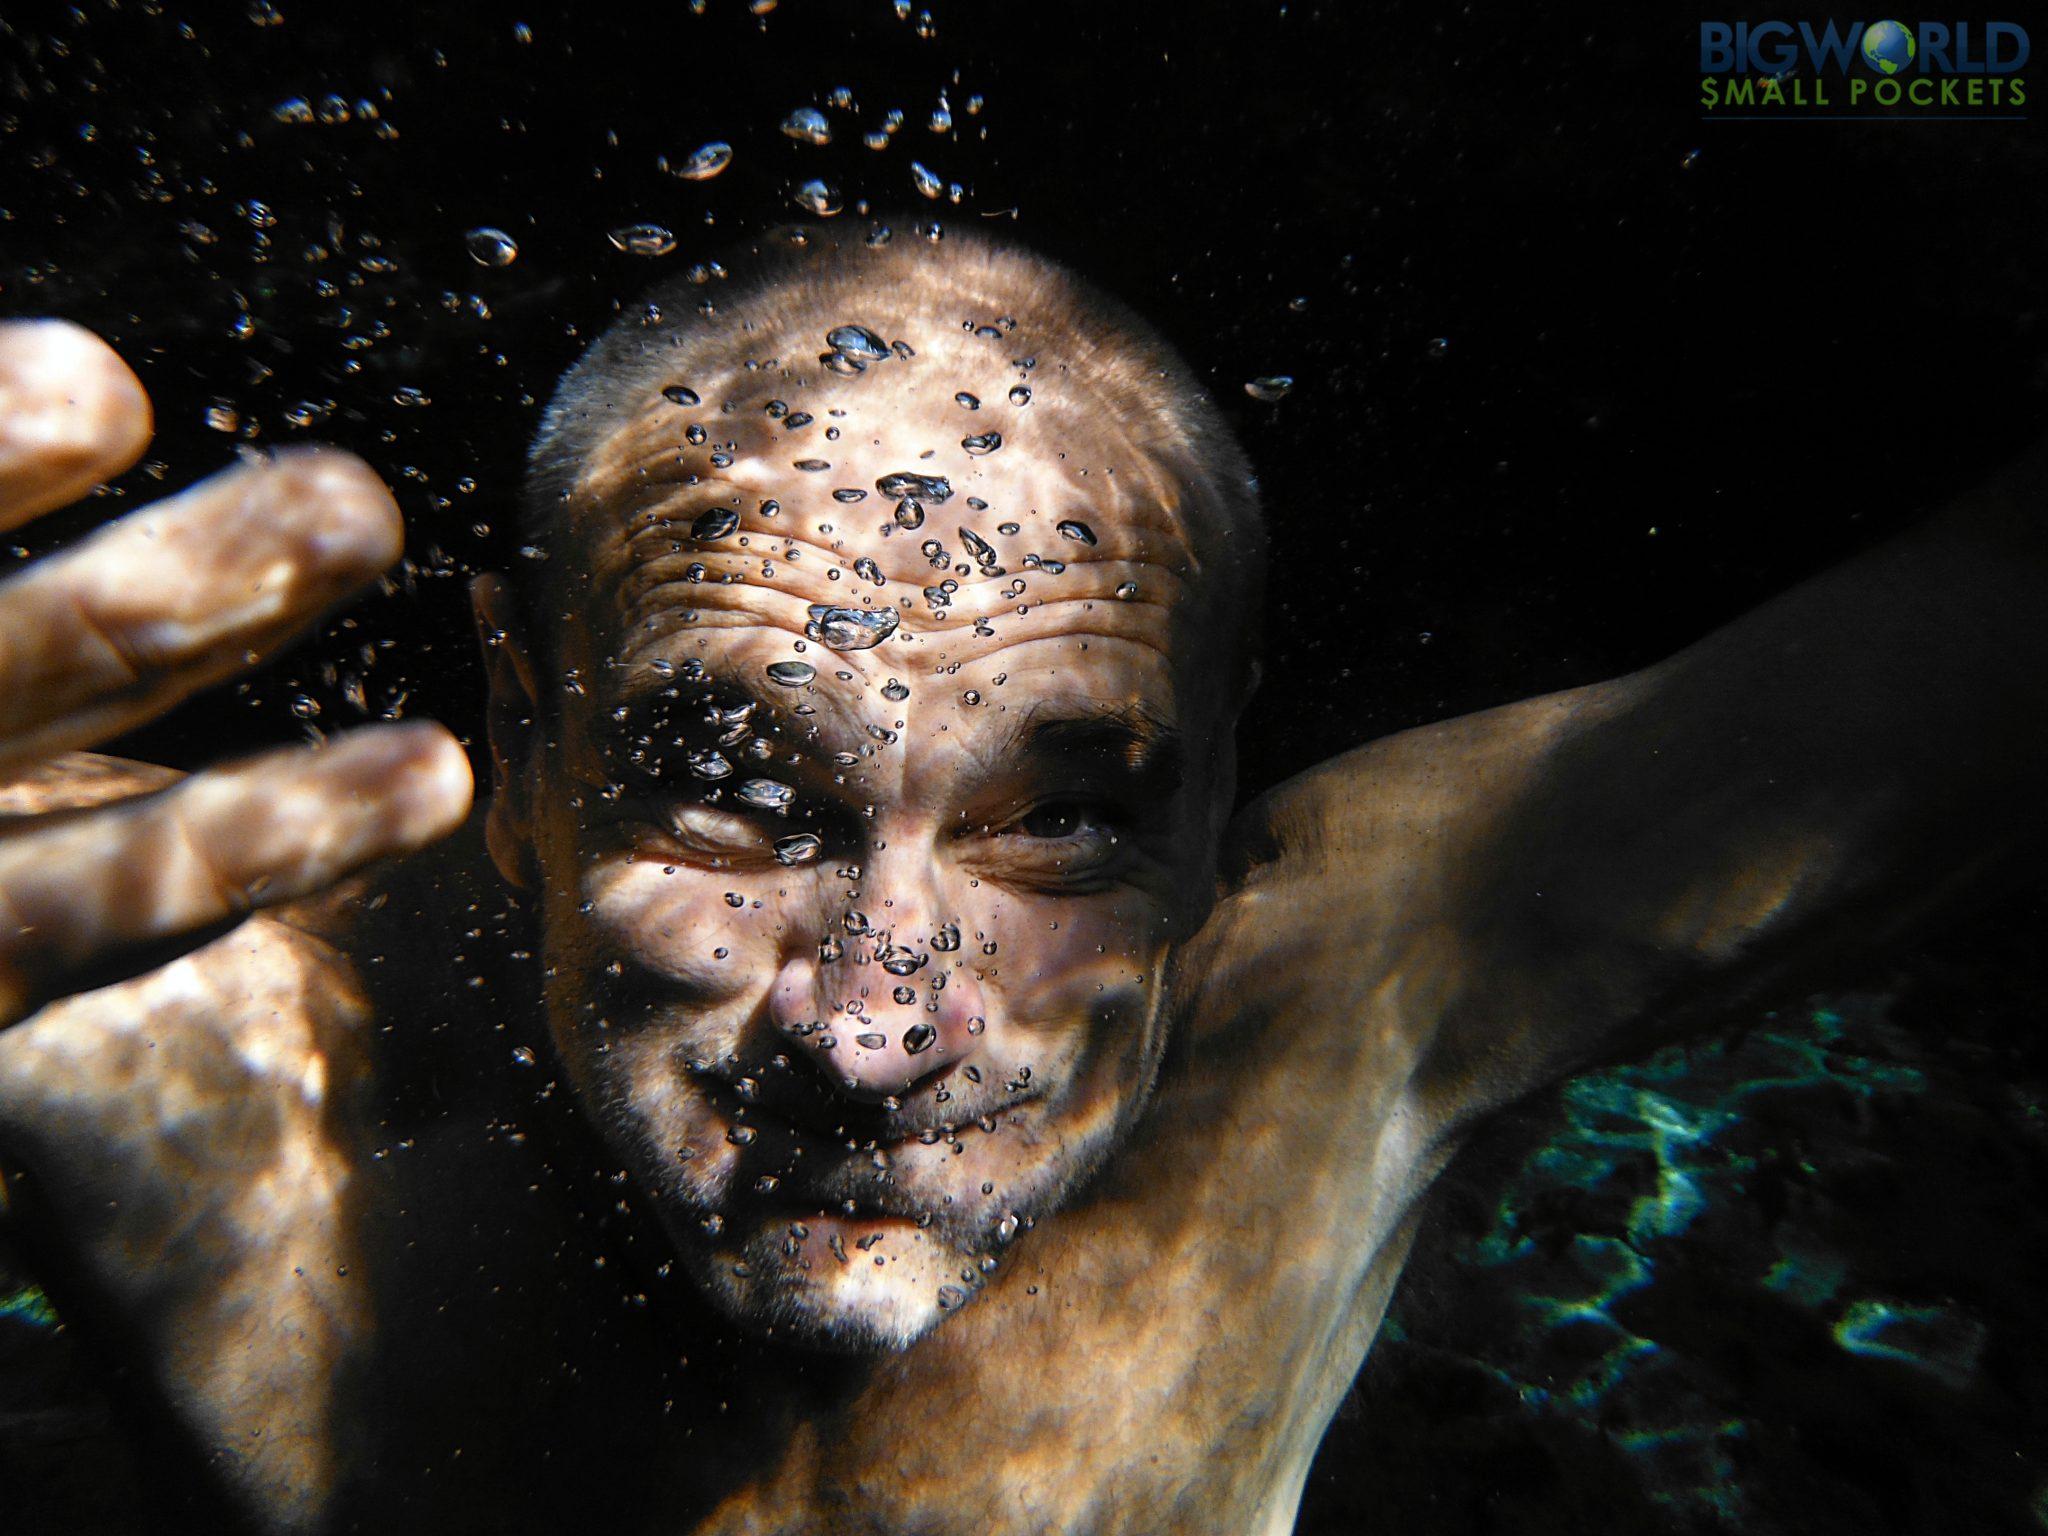 Australia, Mataranka, Hot Springs